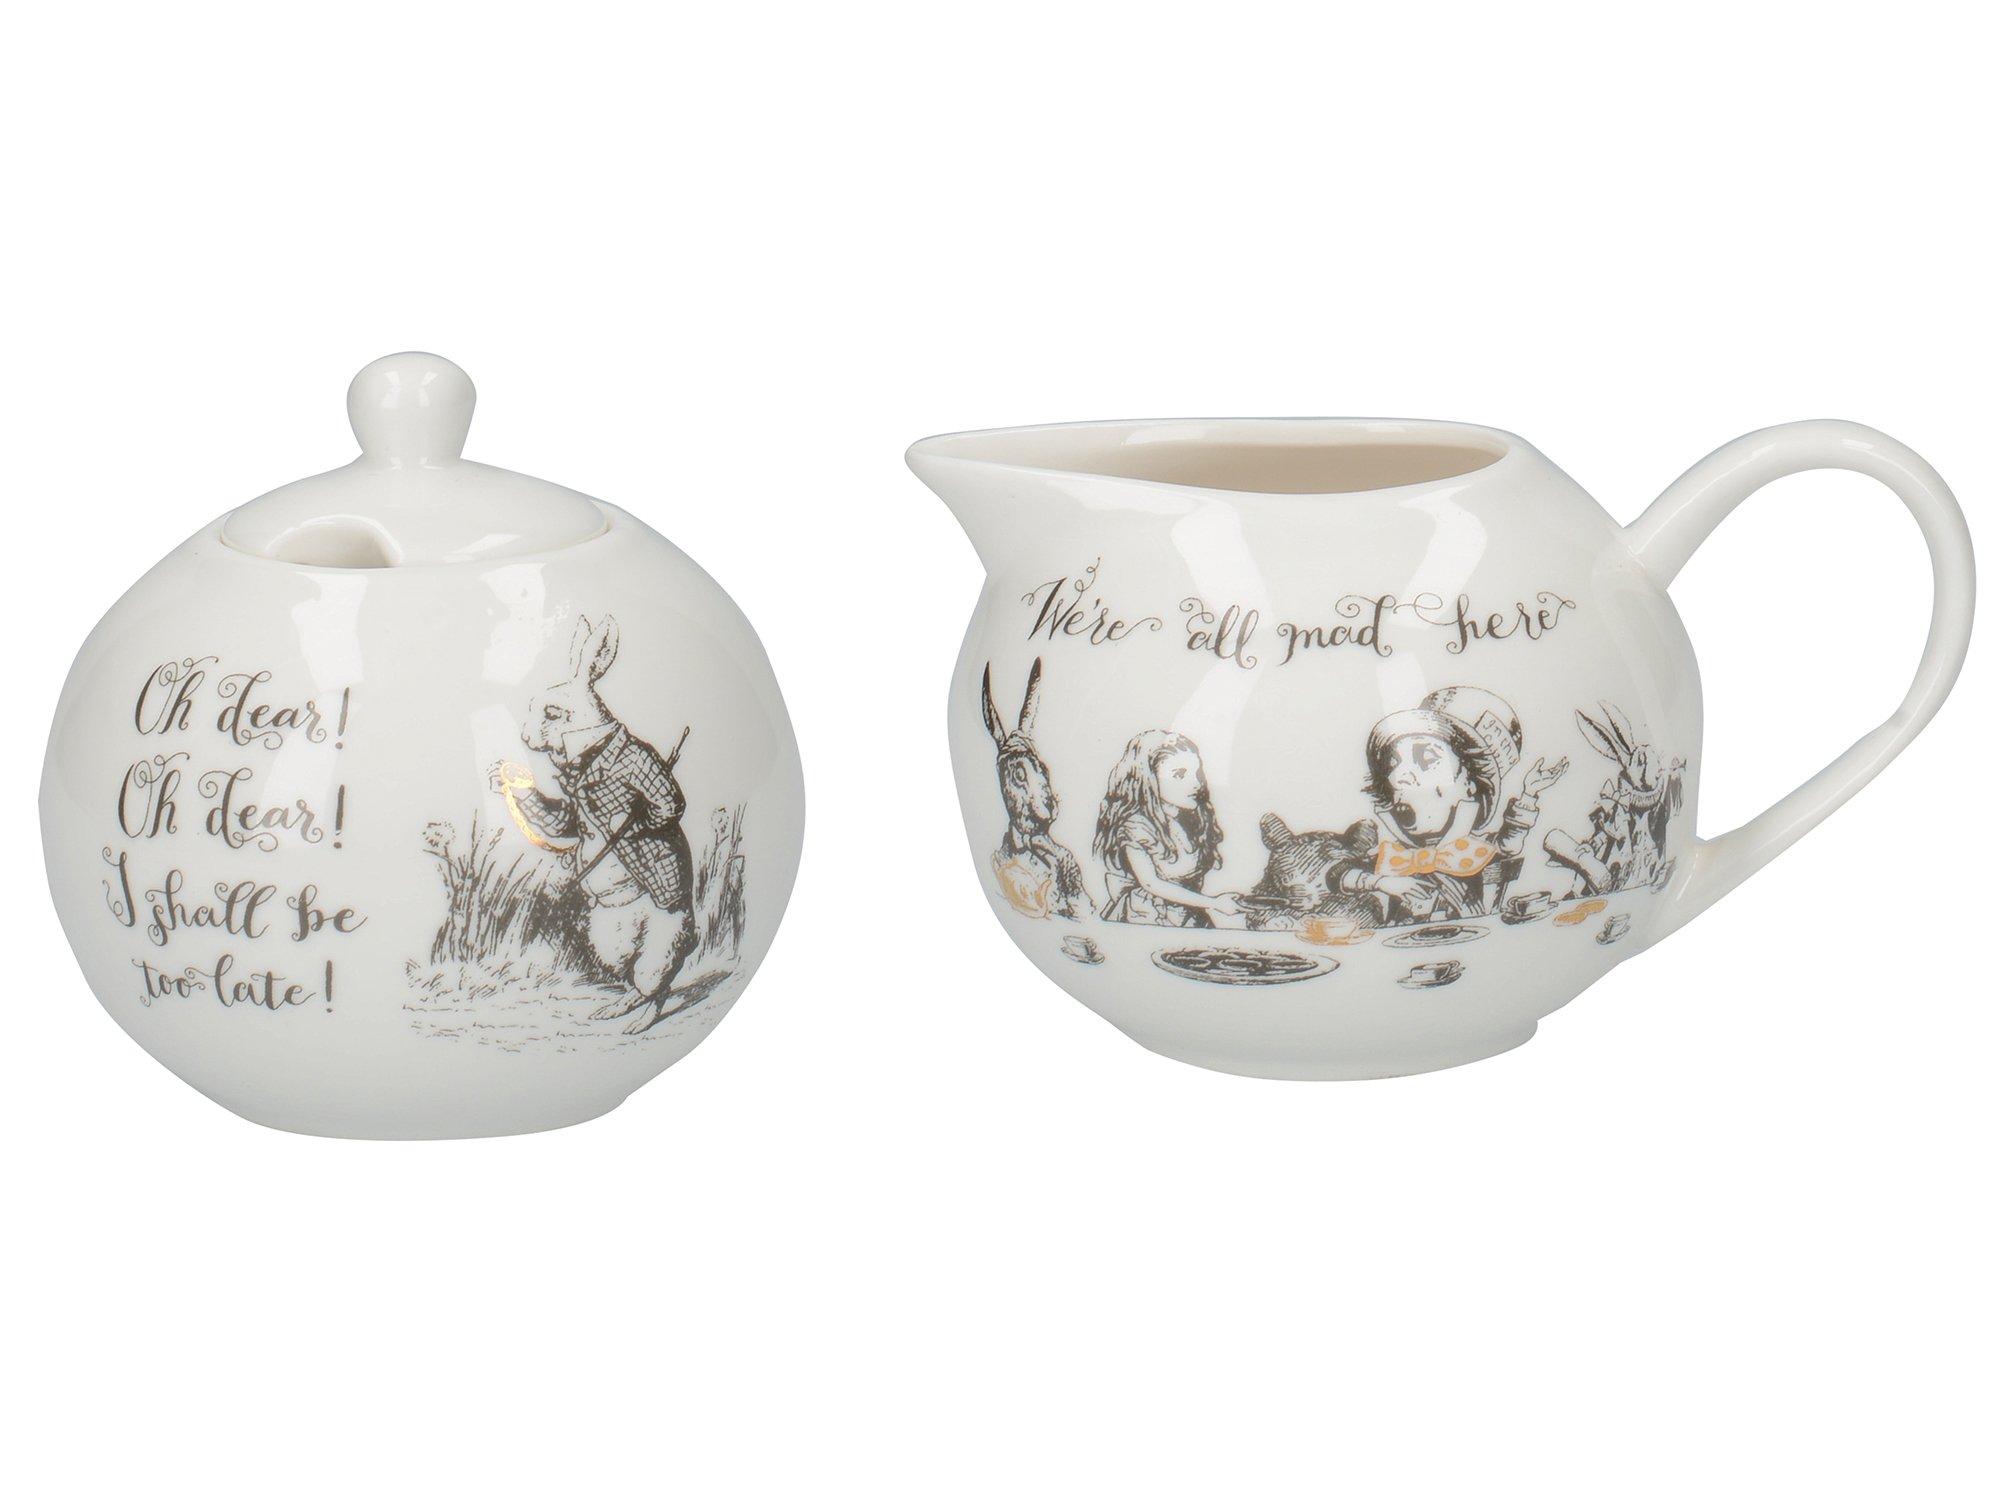 Victoria and Albert Alice in Wonderland Porcelain Sugar Bowl and Creamer Set by CreativeTops